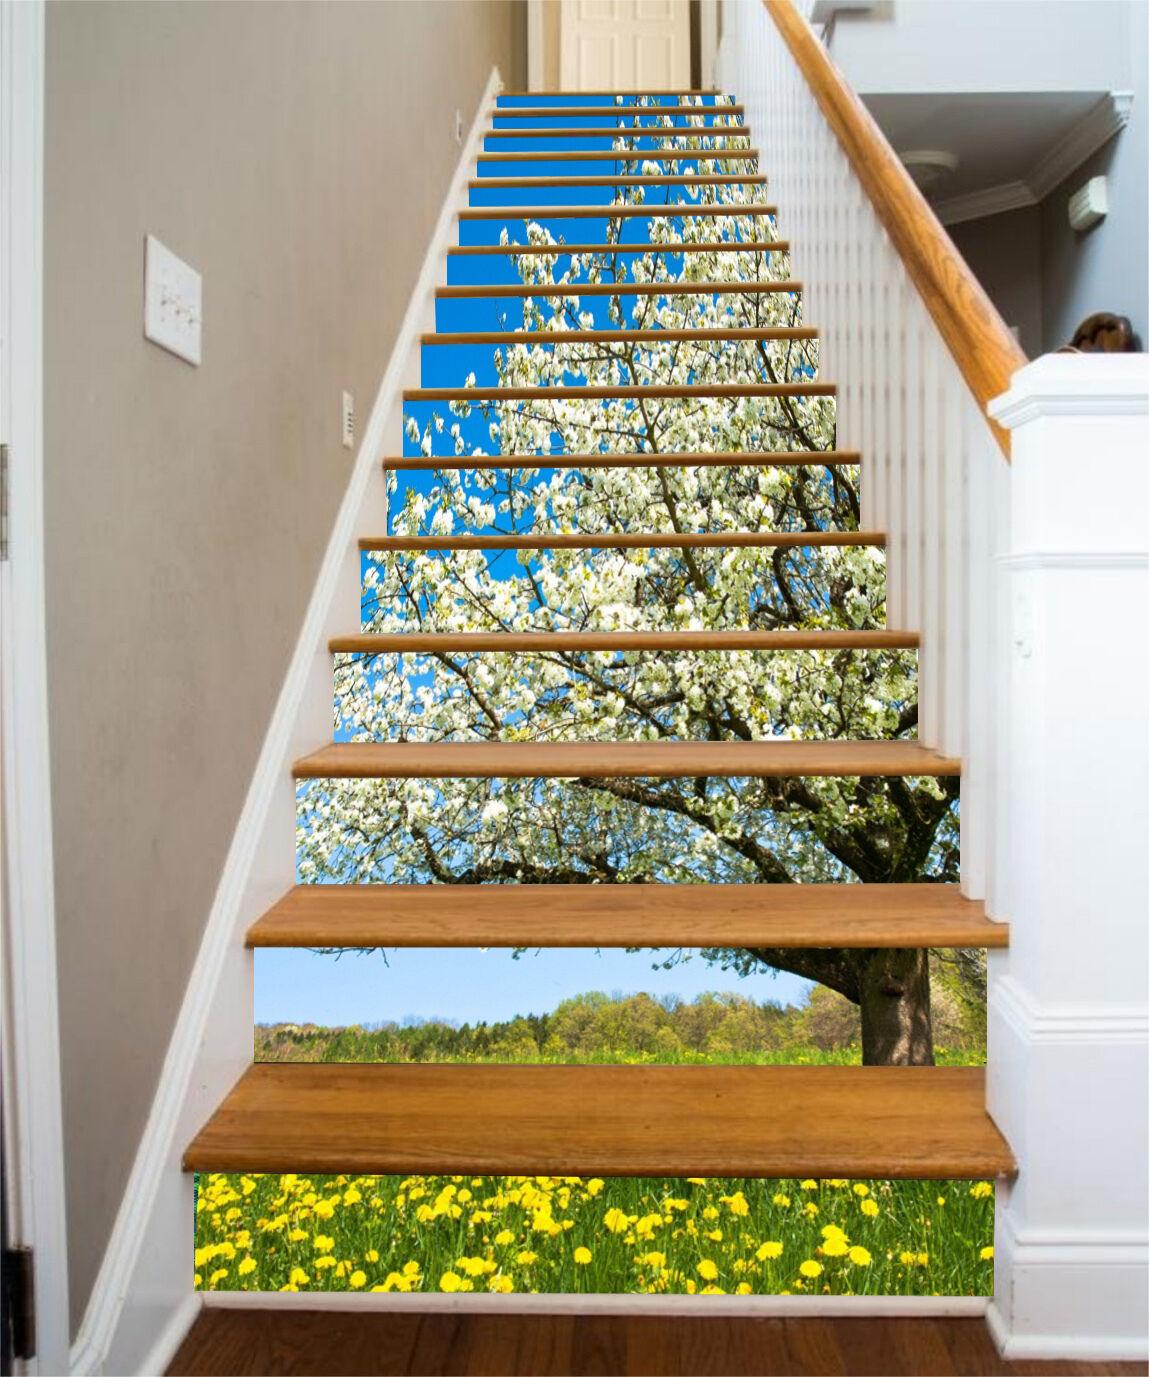 3D Baum Blume 634 Stair Risers Dekoration Fototapete Vinyl Aufkleber Tapete DE